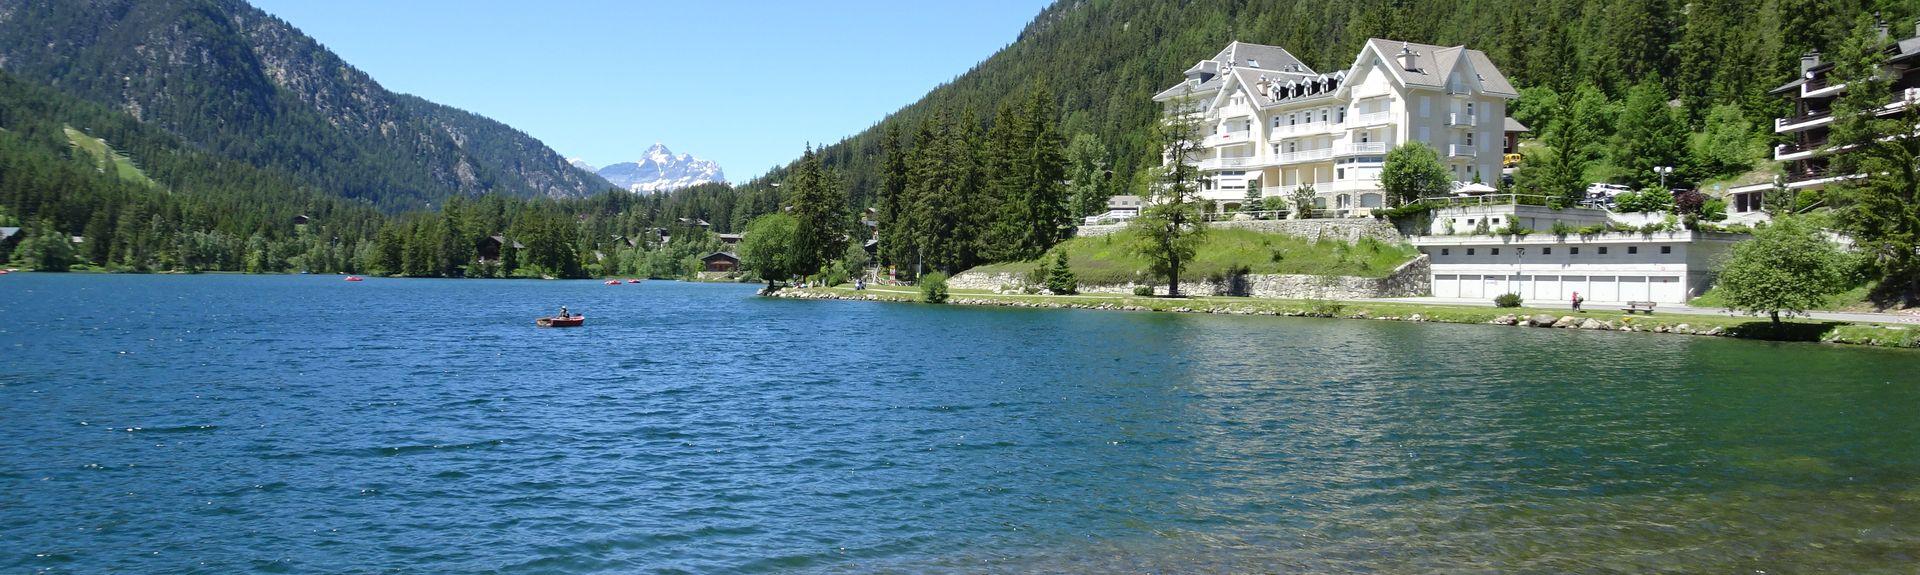 La Fouly, Orsieres, Valais, Switzerland